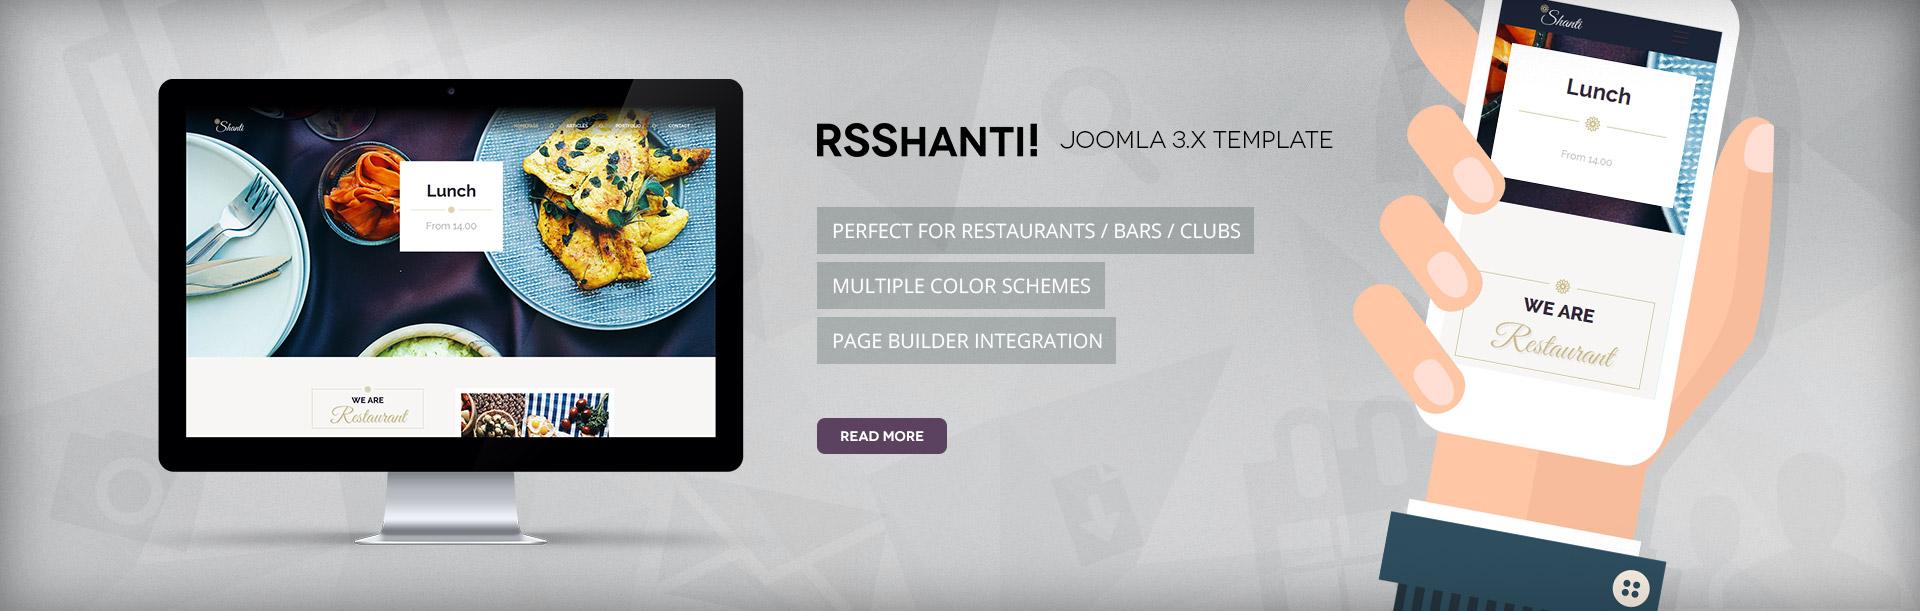 RSShanti!